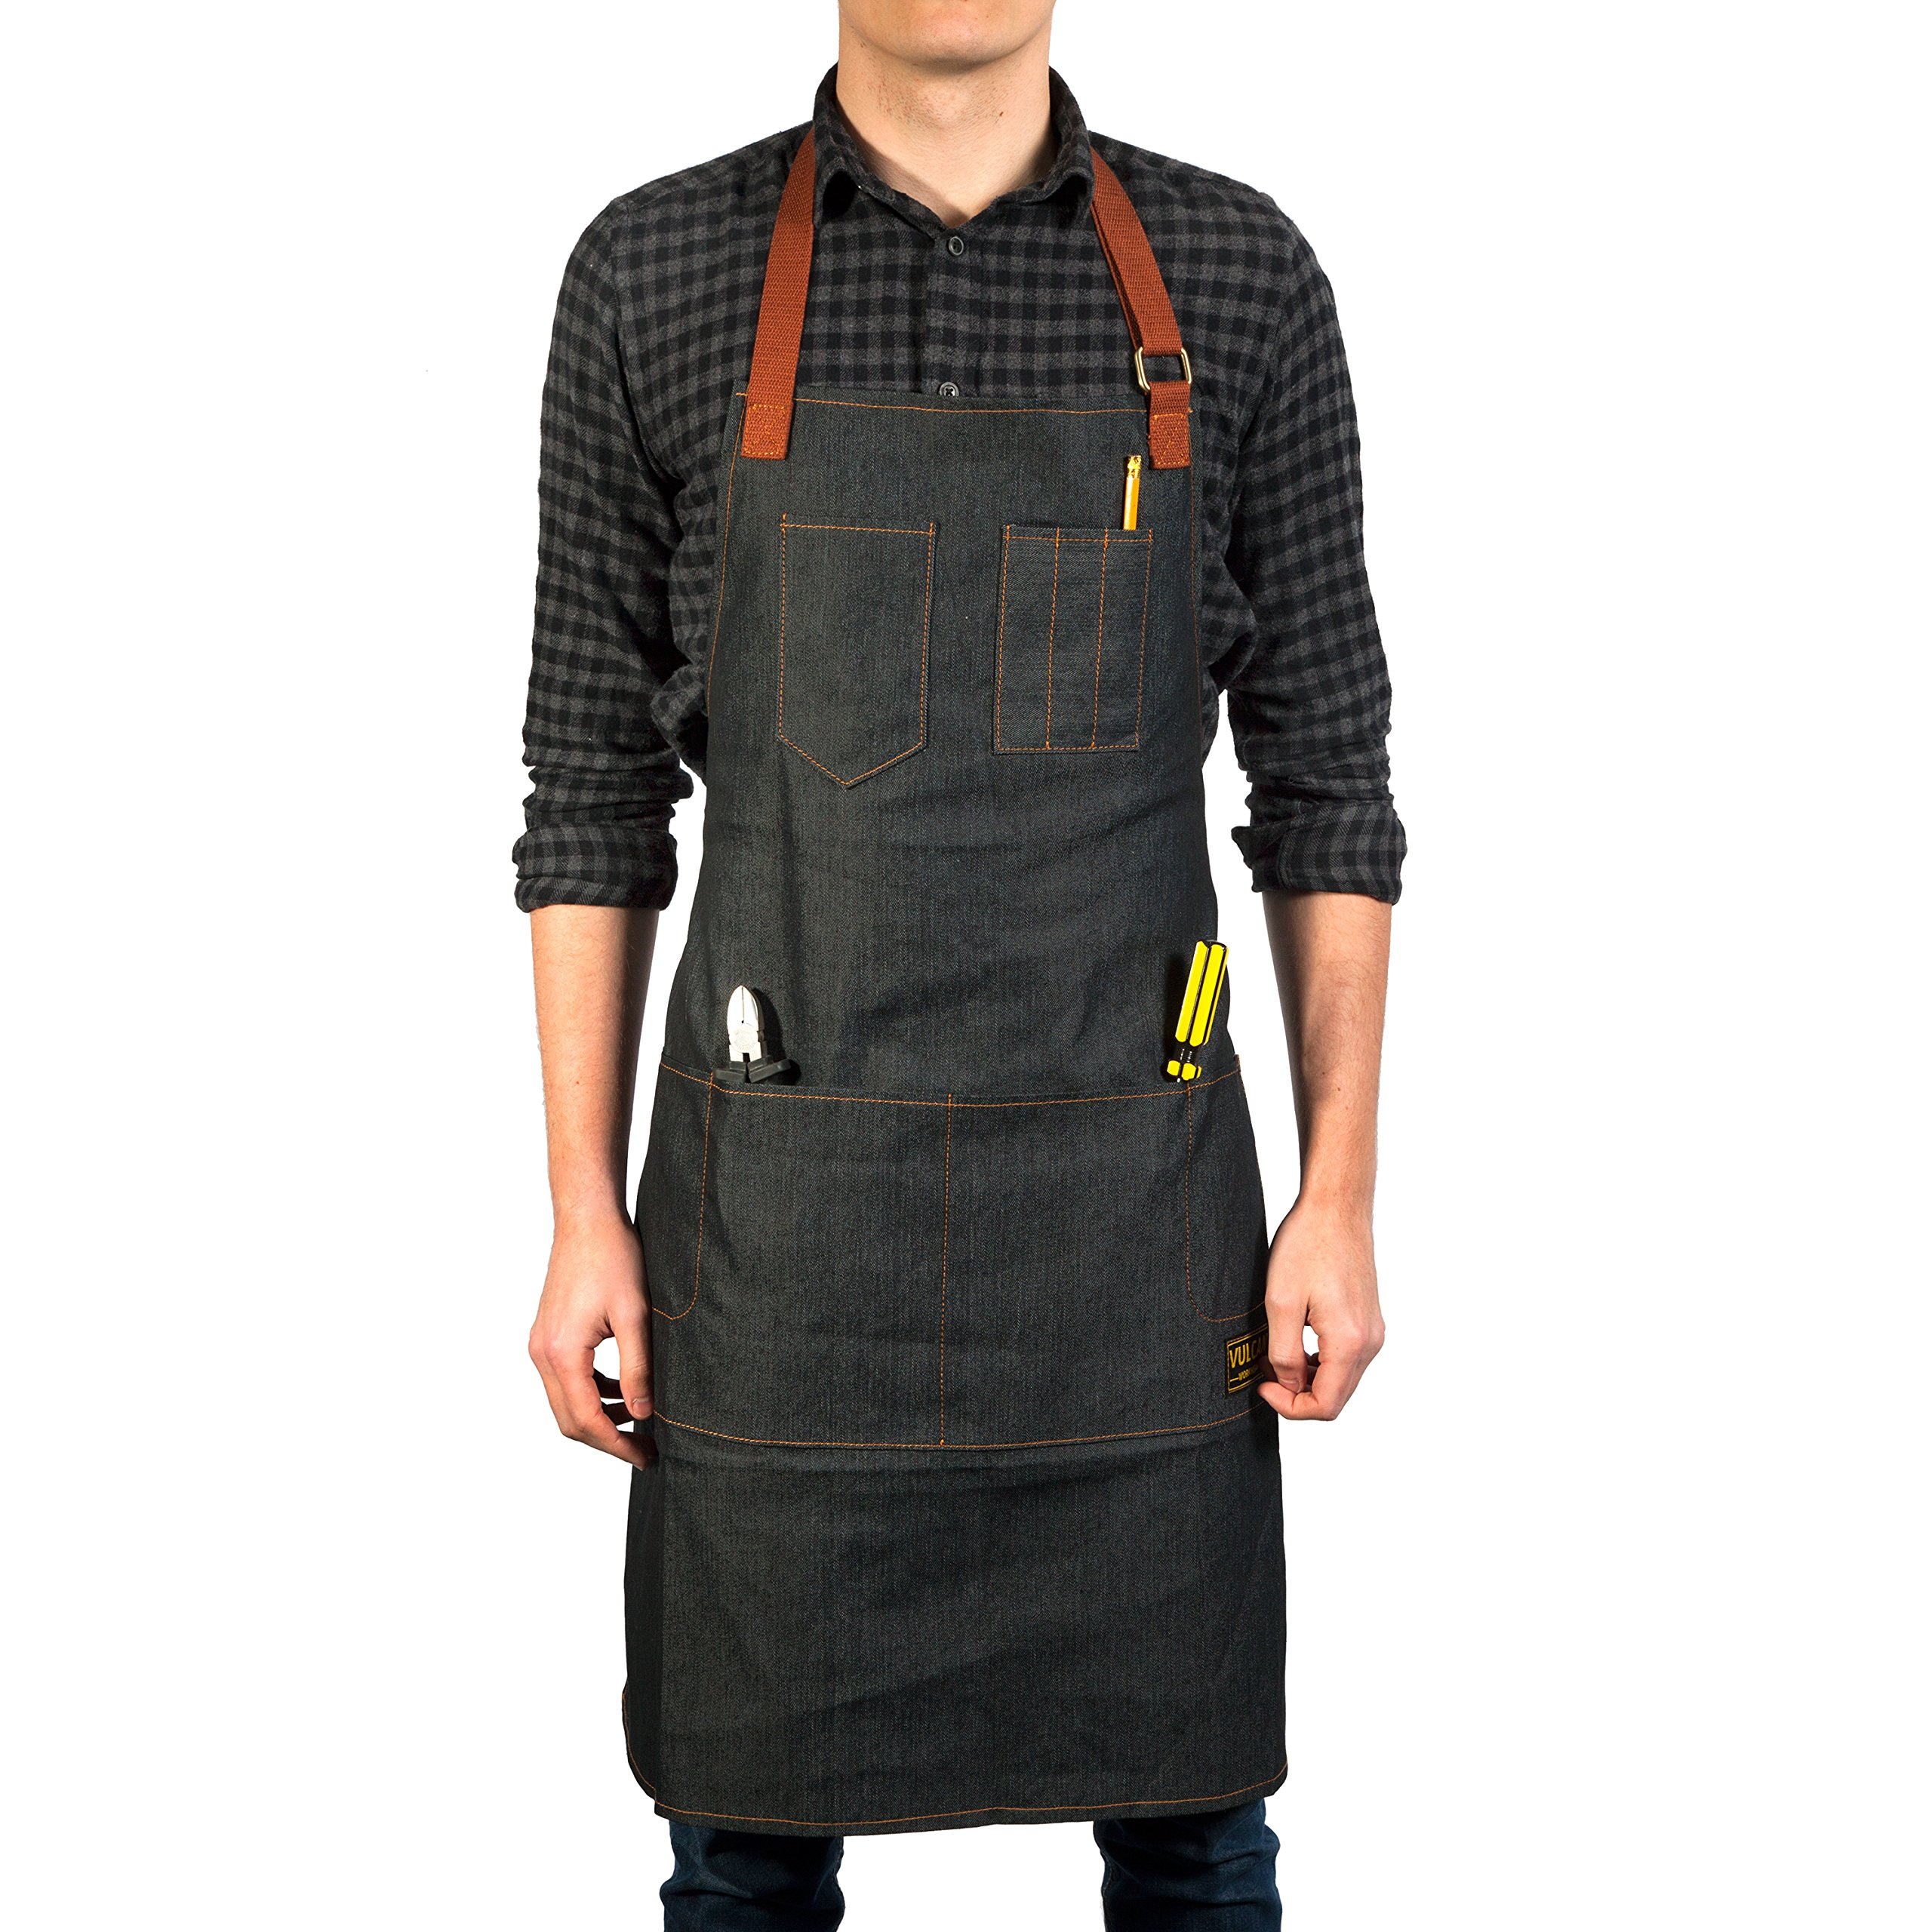 Vulcan Workwear Utility Apron - Multi-Use Shop Apron with Pockets - Lightweight Denim Tool Apron by Vulcan Workwear (Image #1)